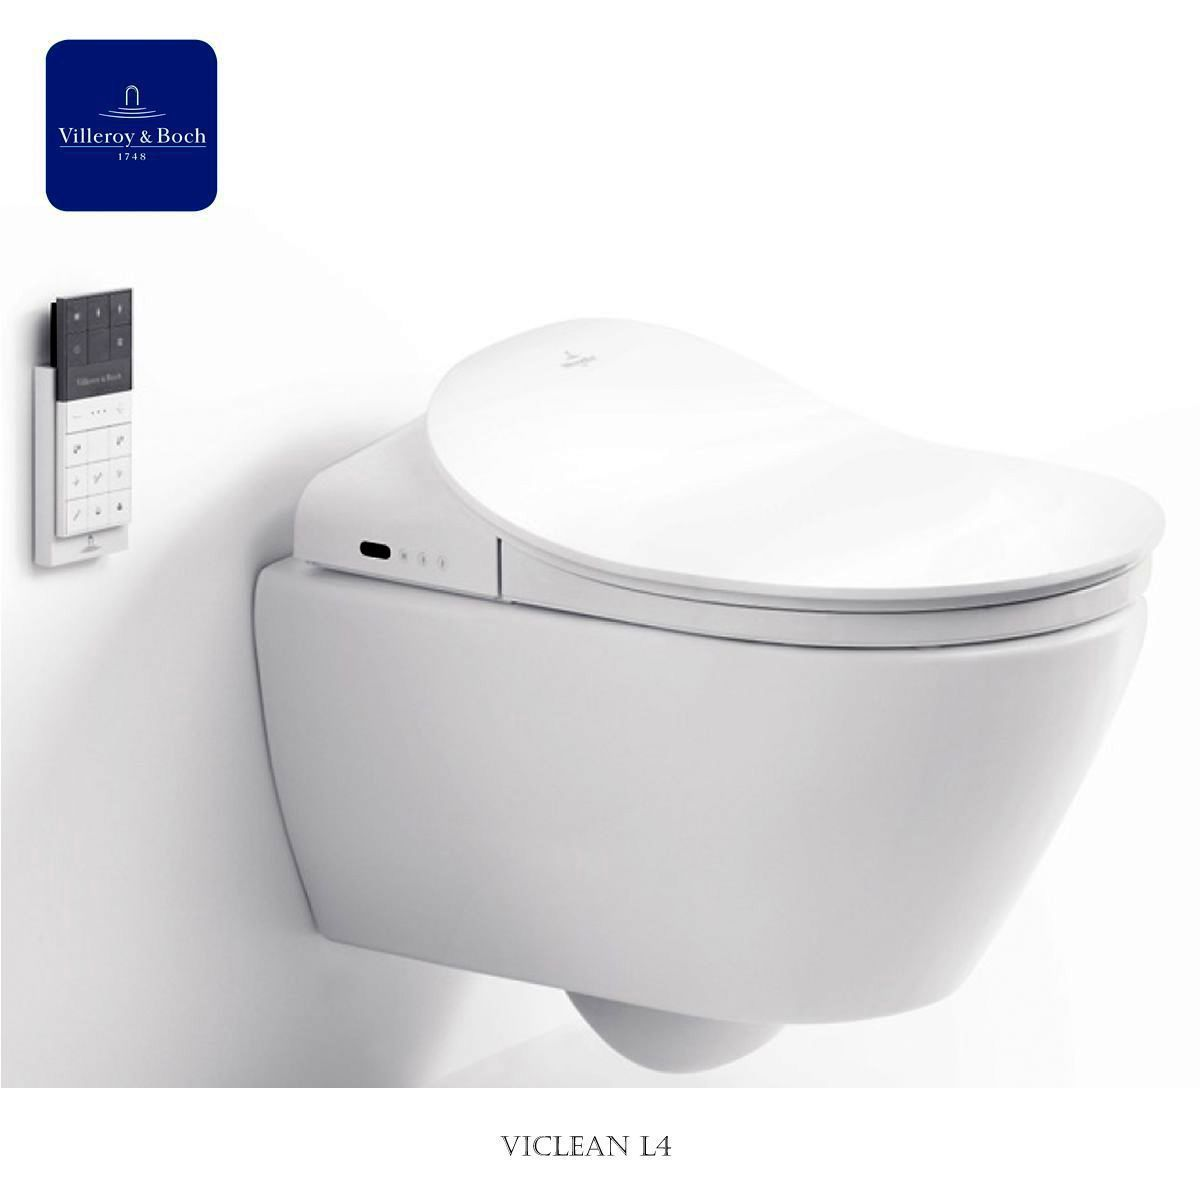 circular toilet seat uk. Villeroy  Boch ViClean Electronic Bidet Toilet Seat UK Bathrooms